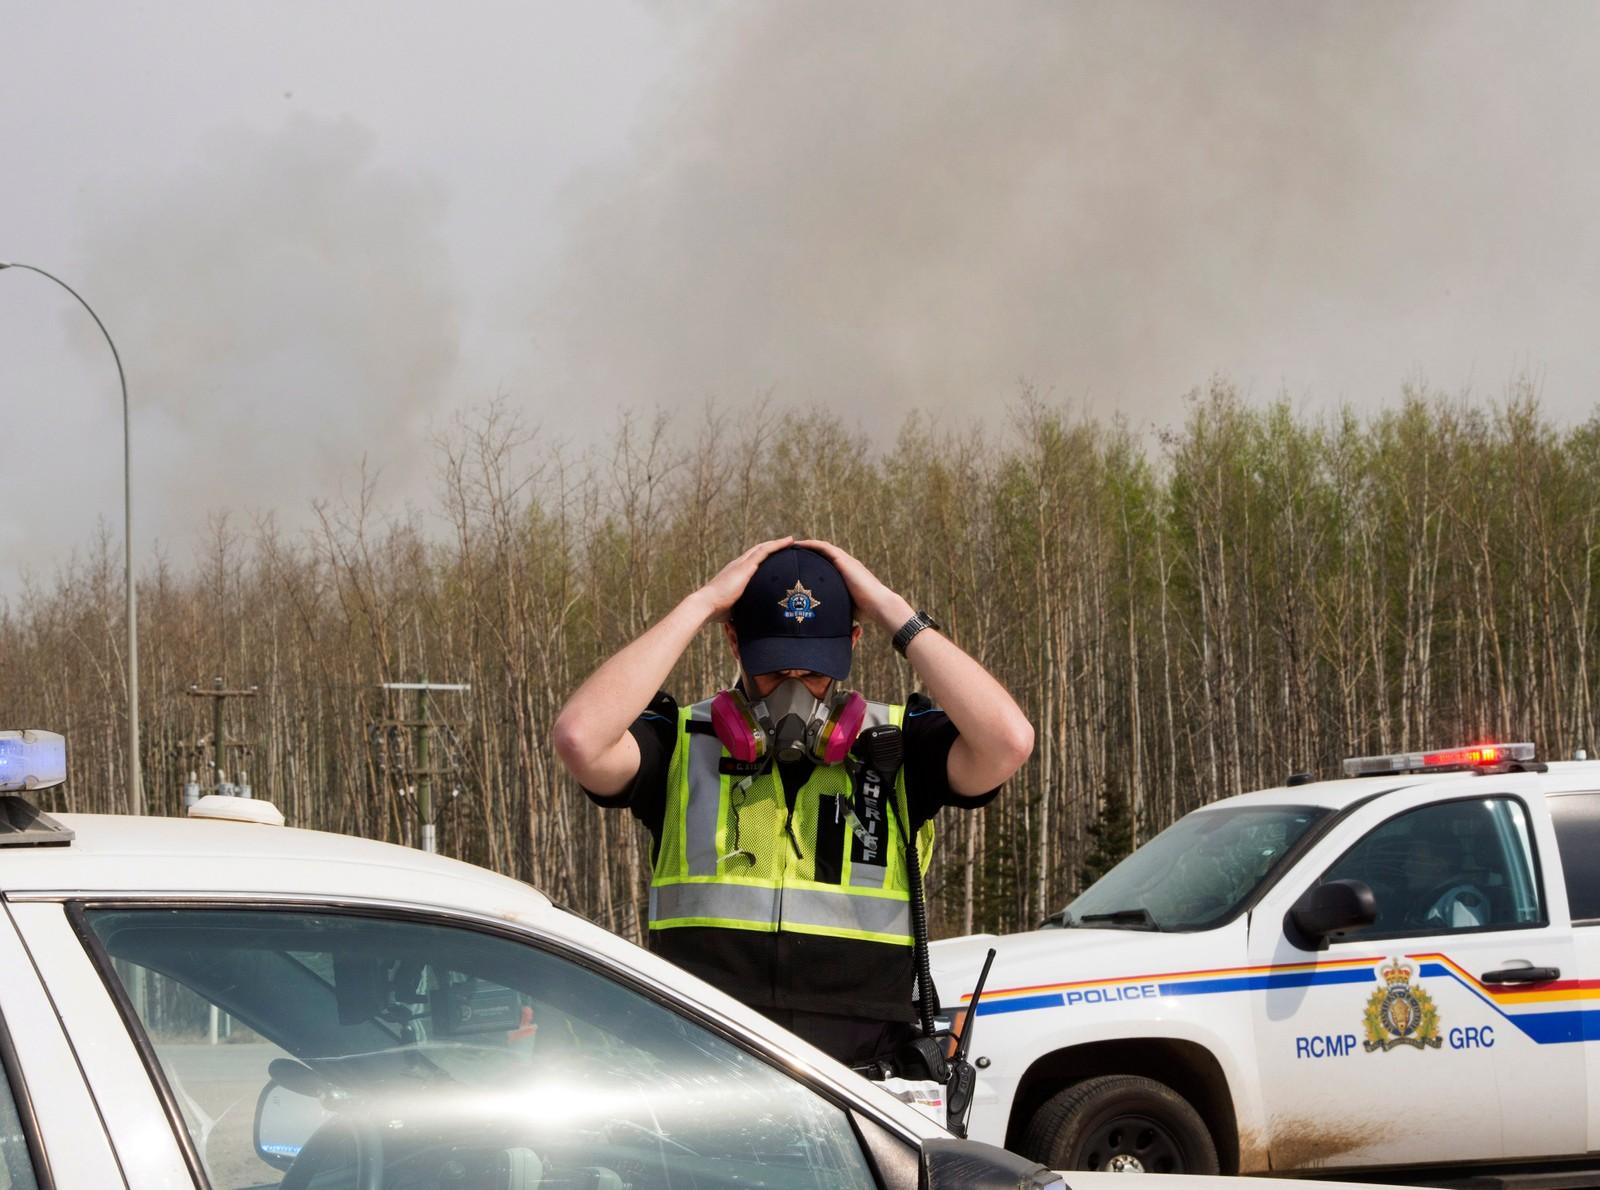 En politimann tar på seg en gassmaske mot røyken fra skogbrannen i Alberta, Canada.